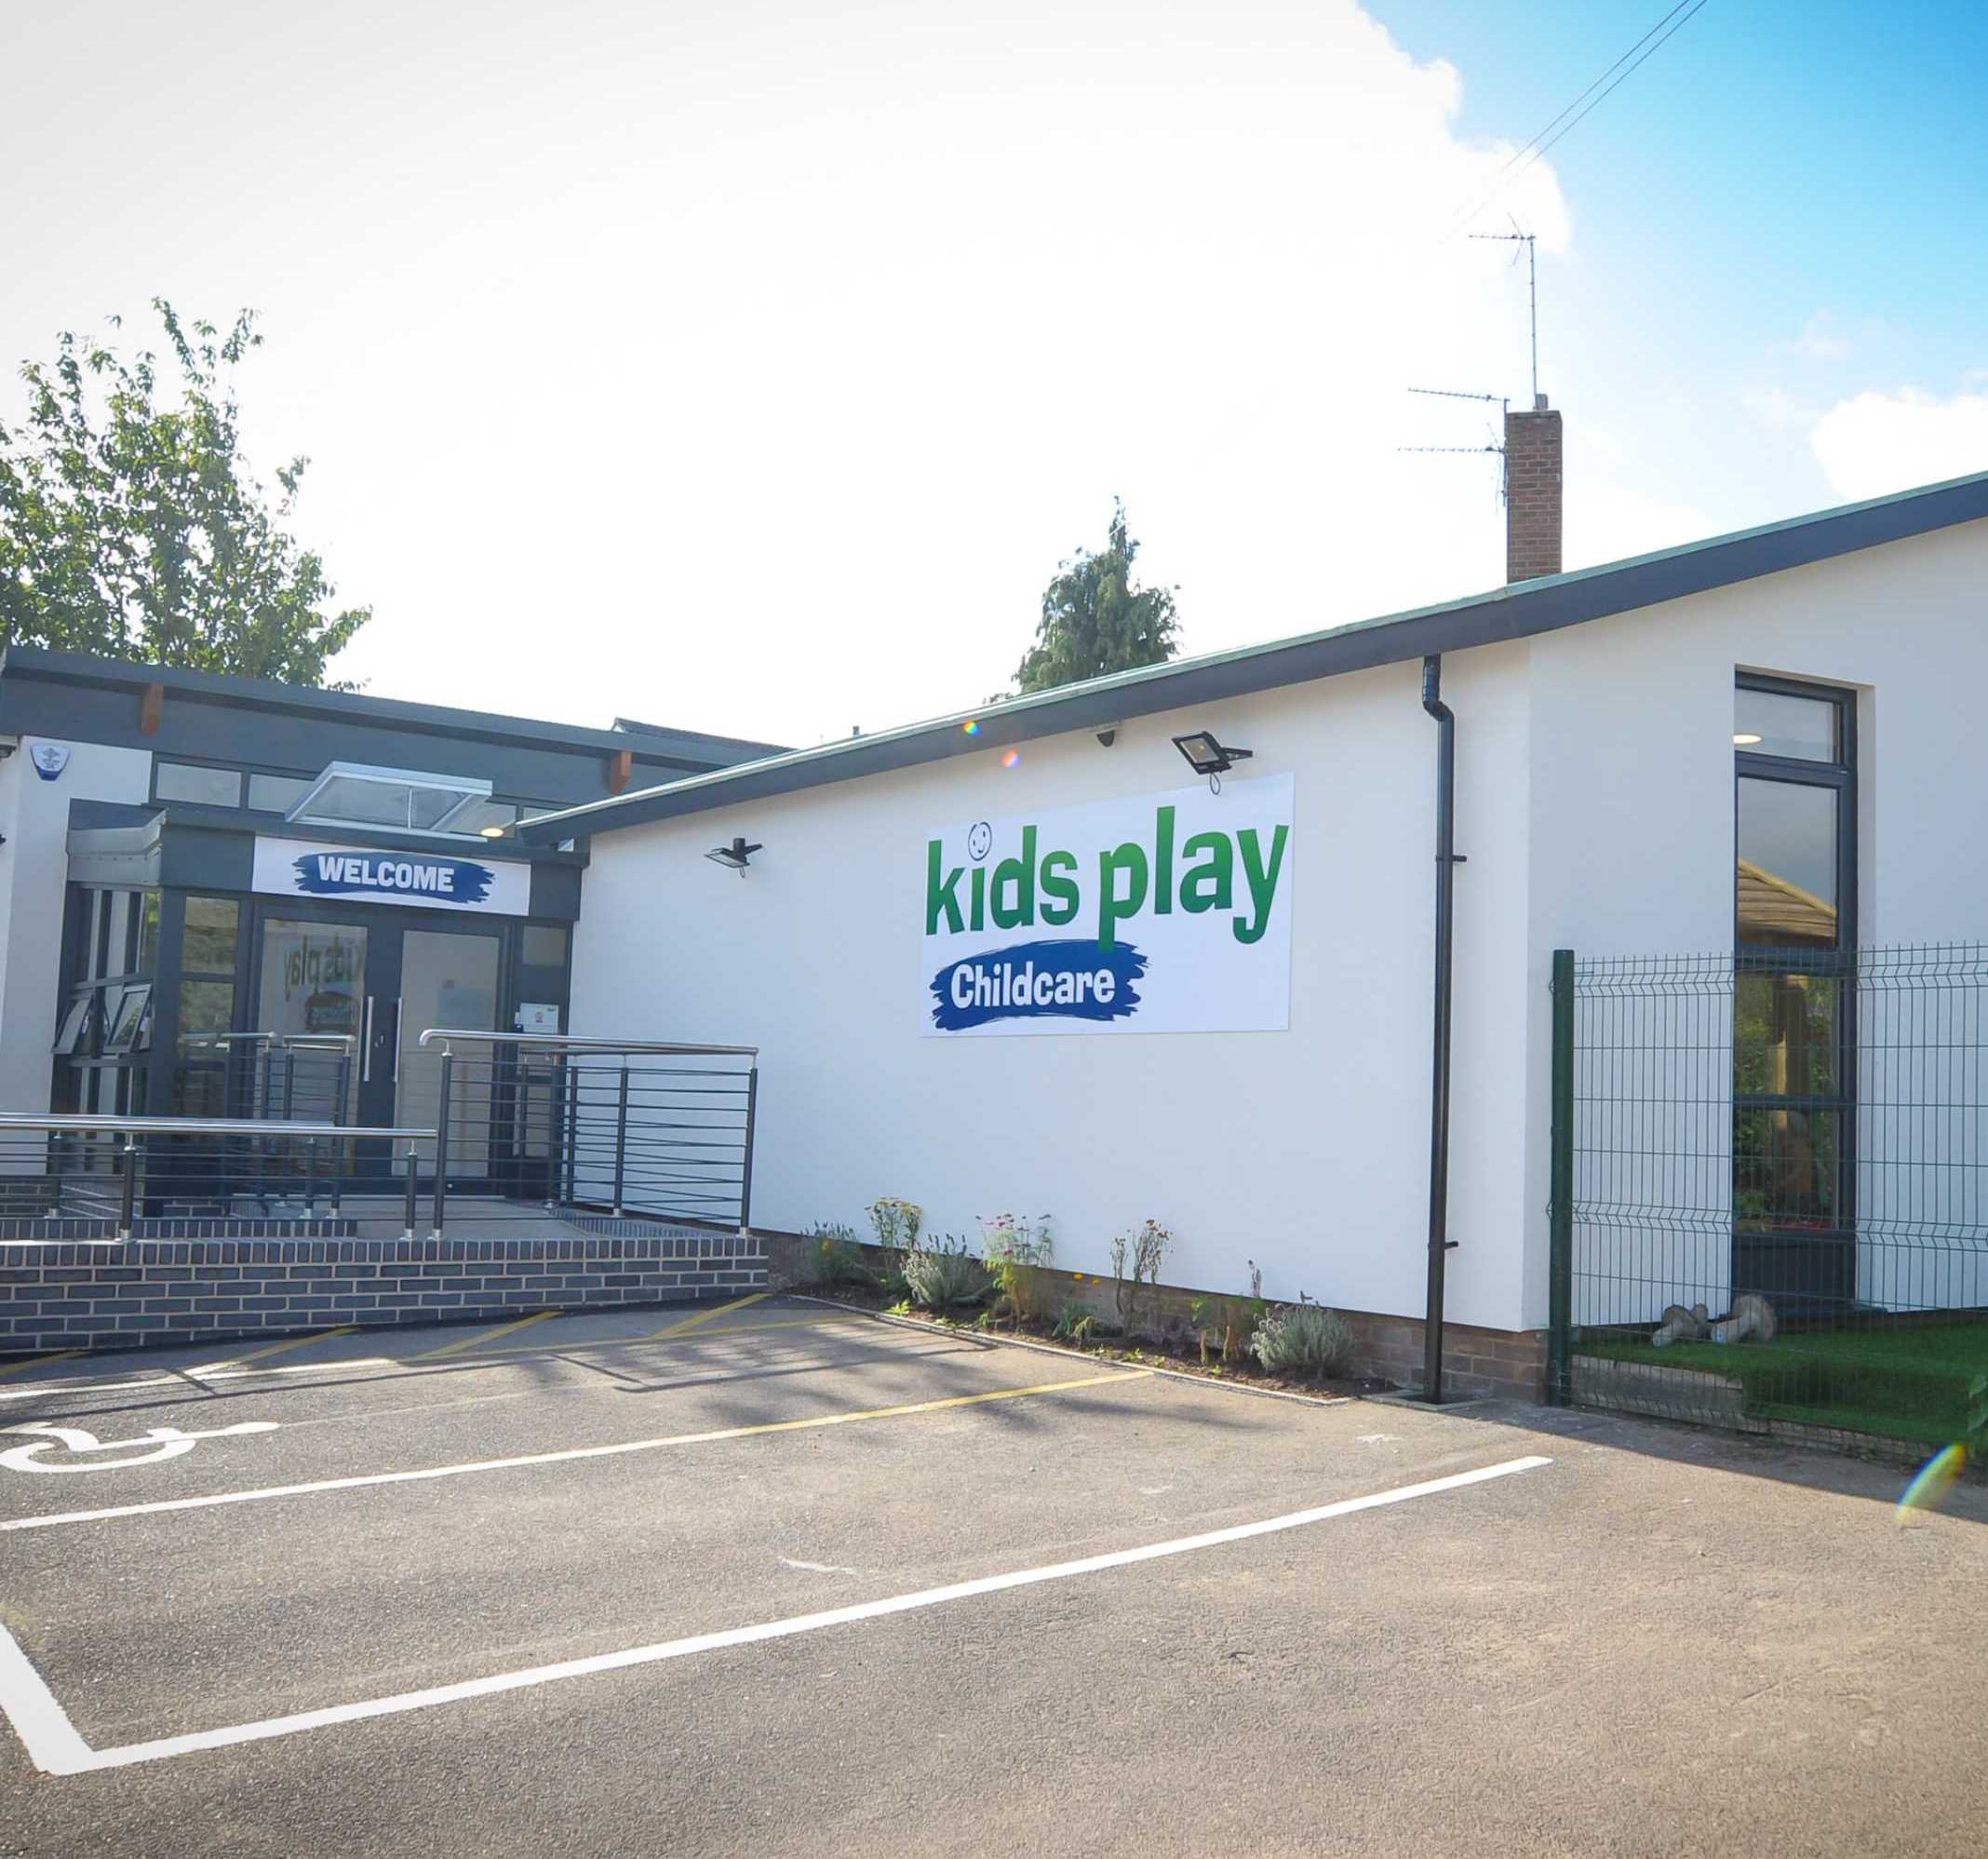 Bury St Edmunds Day Nursery & Pre-School exterior